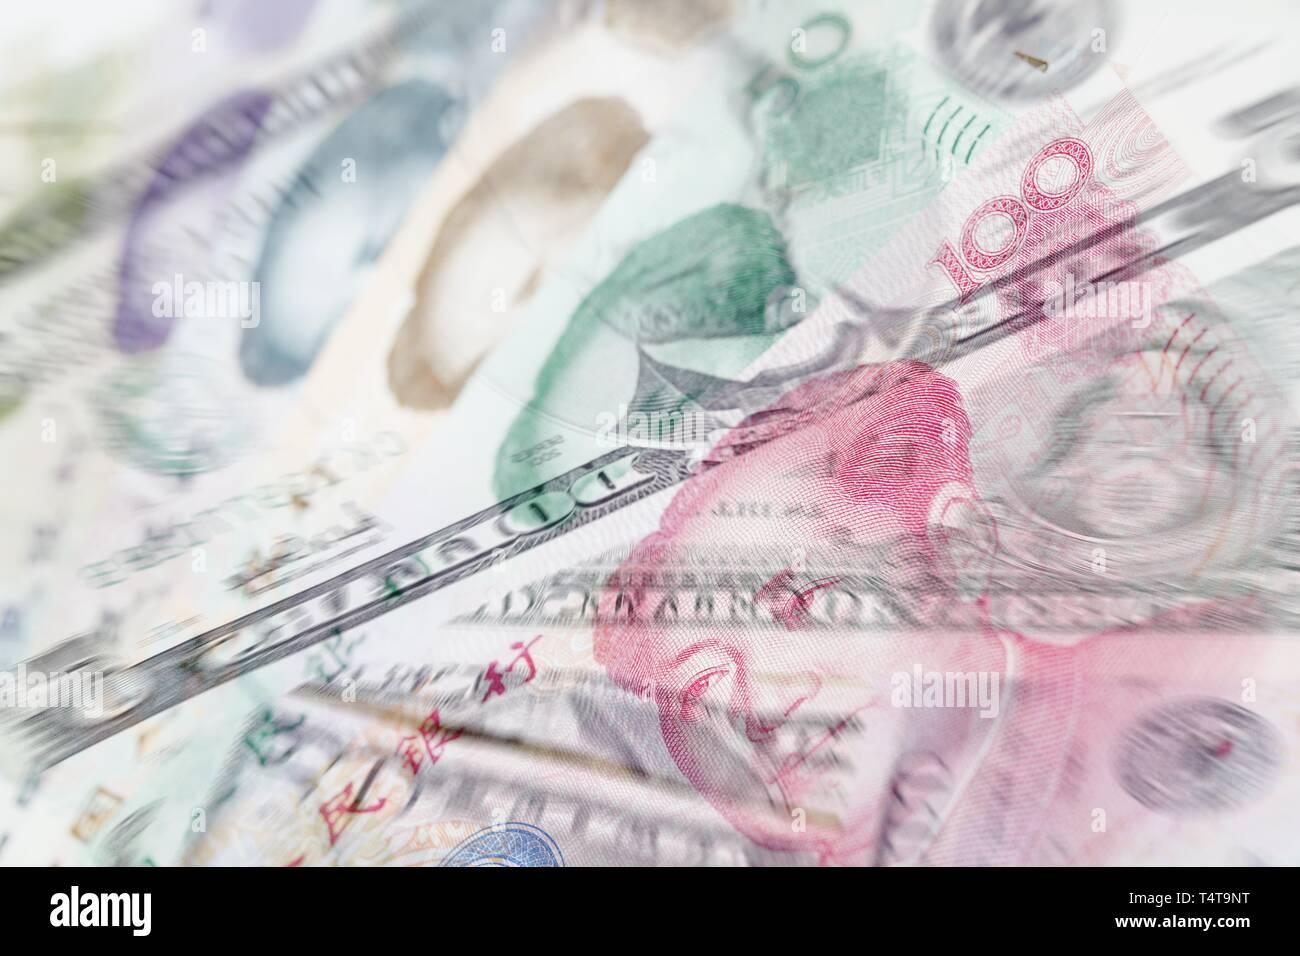 Chinese Yuan and US Dollar notes, blurred, symbol photo - Stock Image